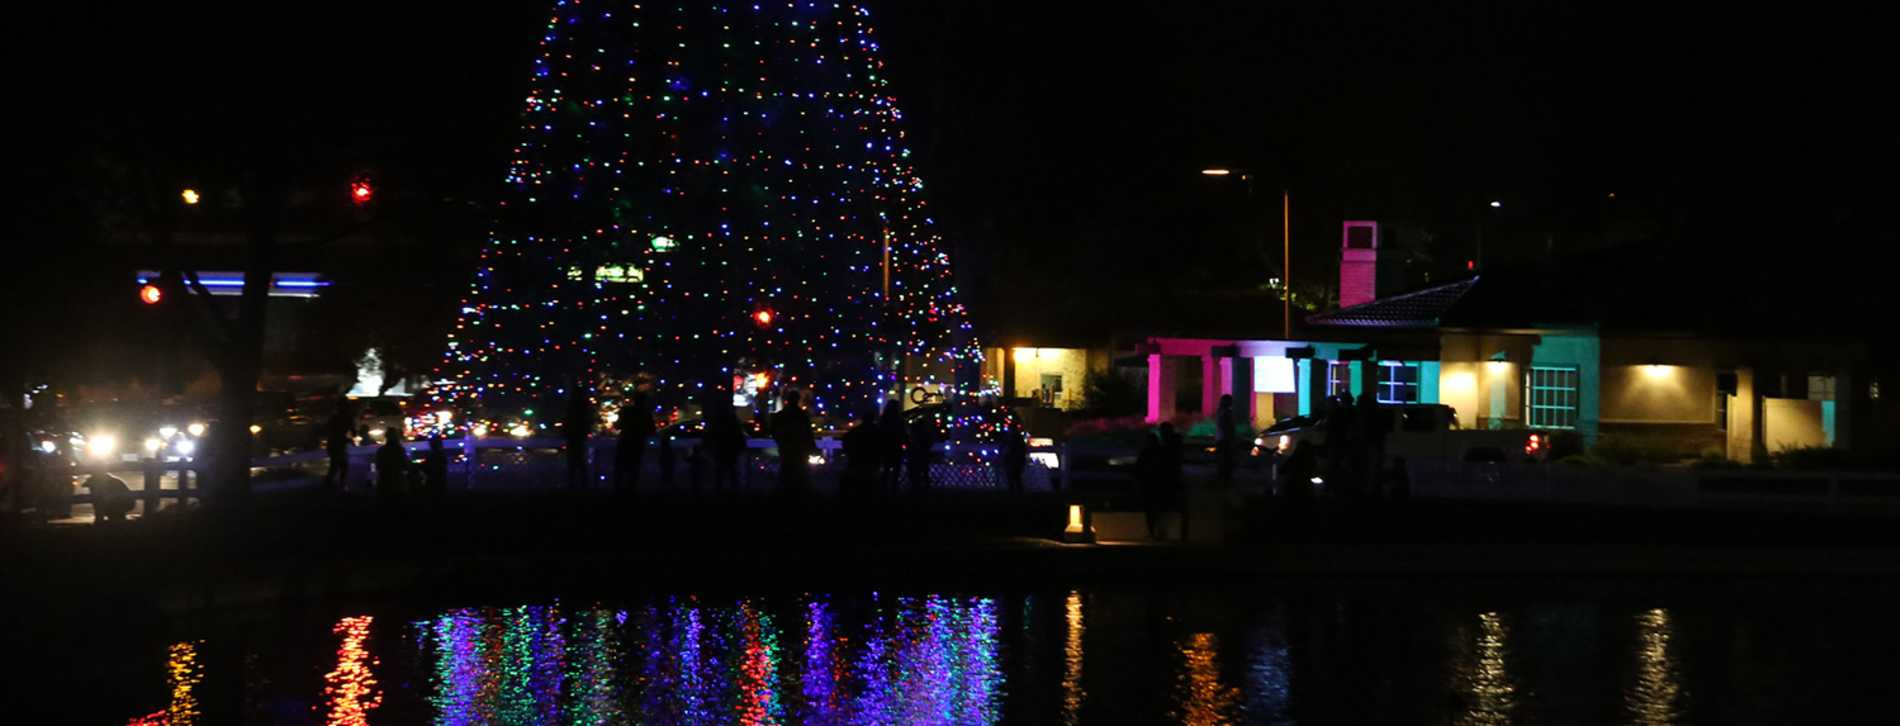 Purple Christmas Tree Lights.Christmas Tree Lighting At The Pond